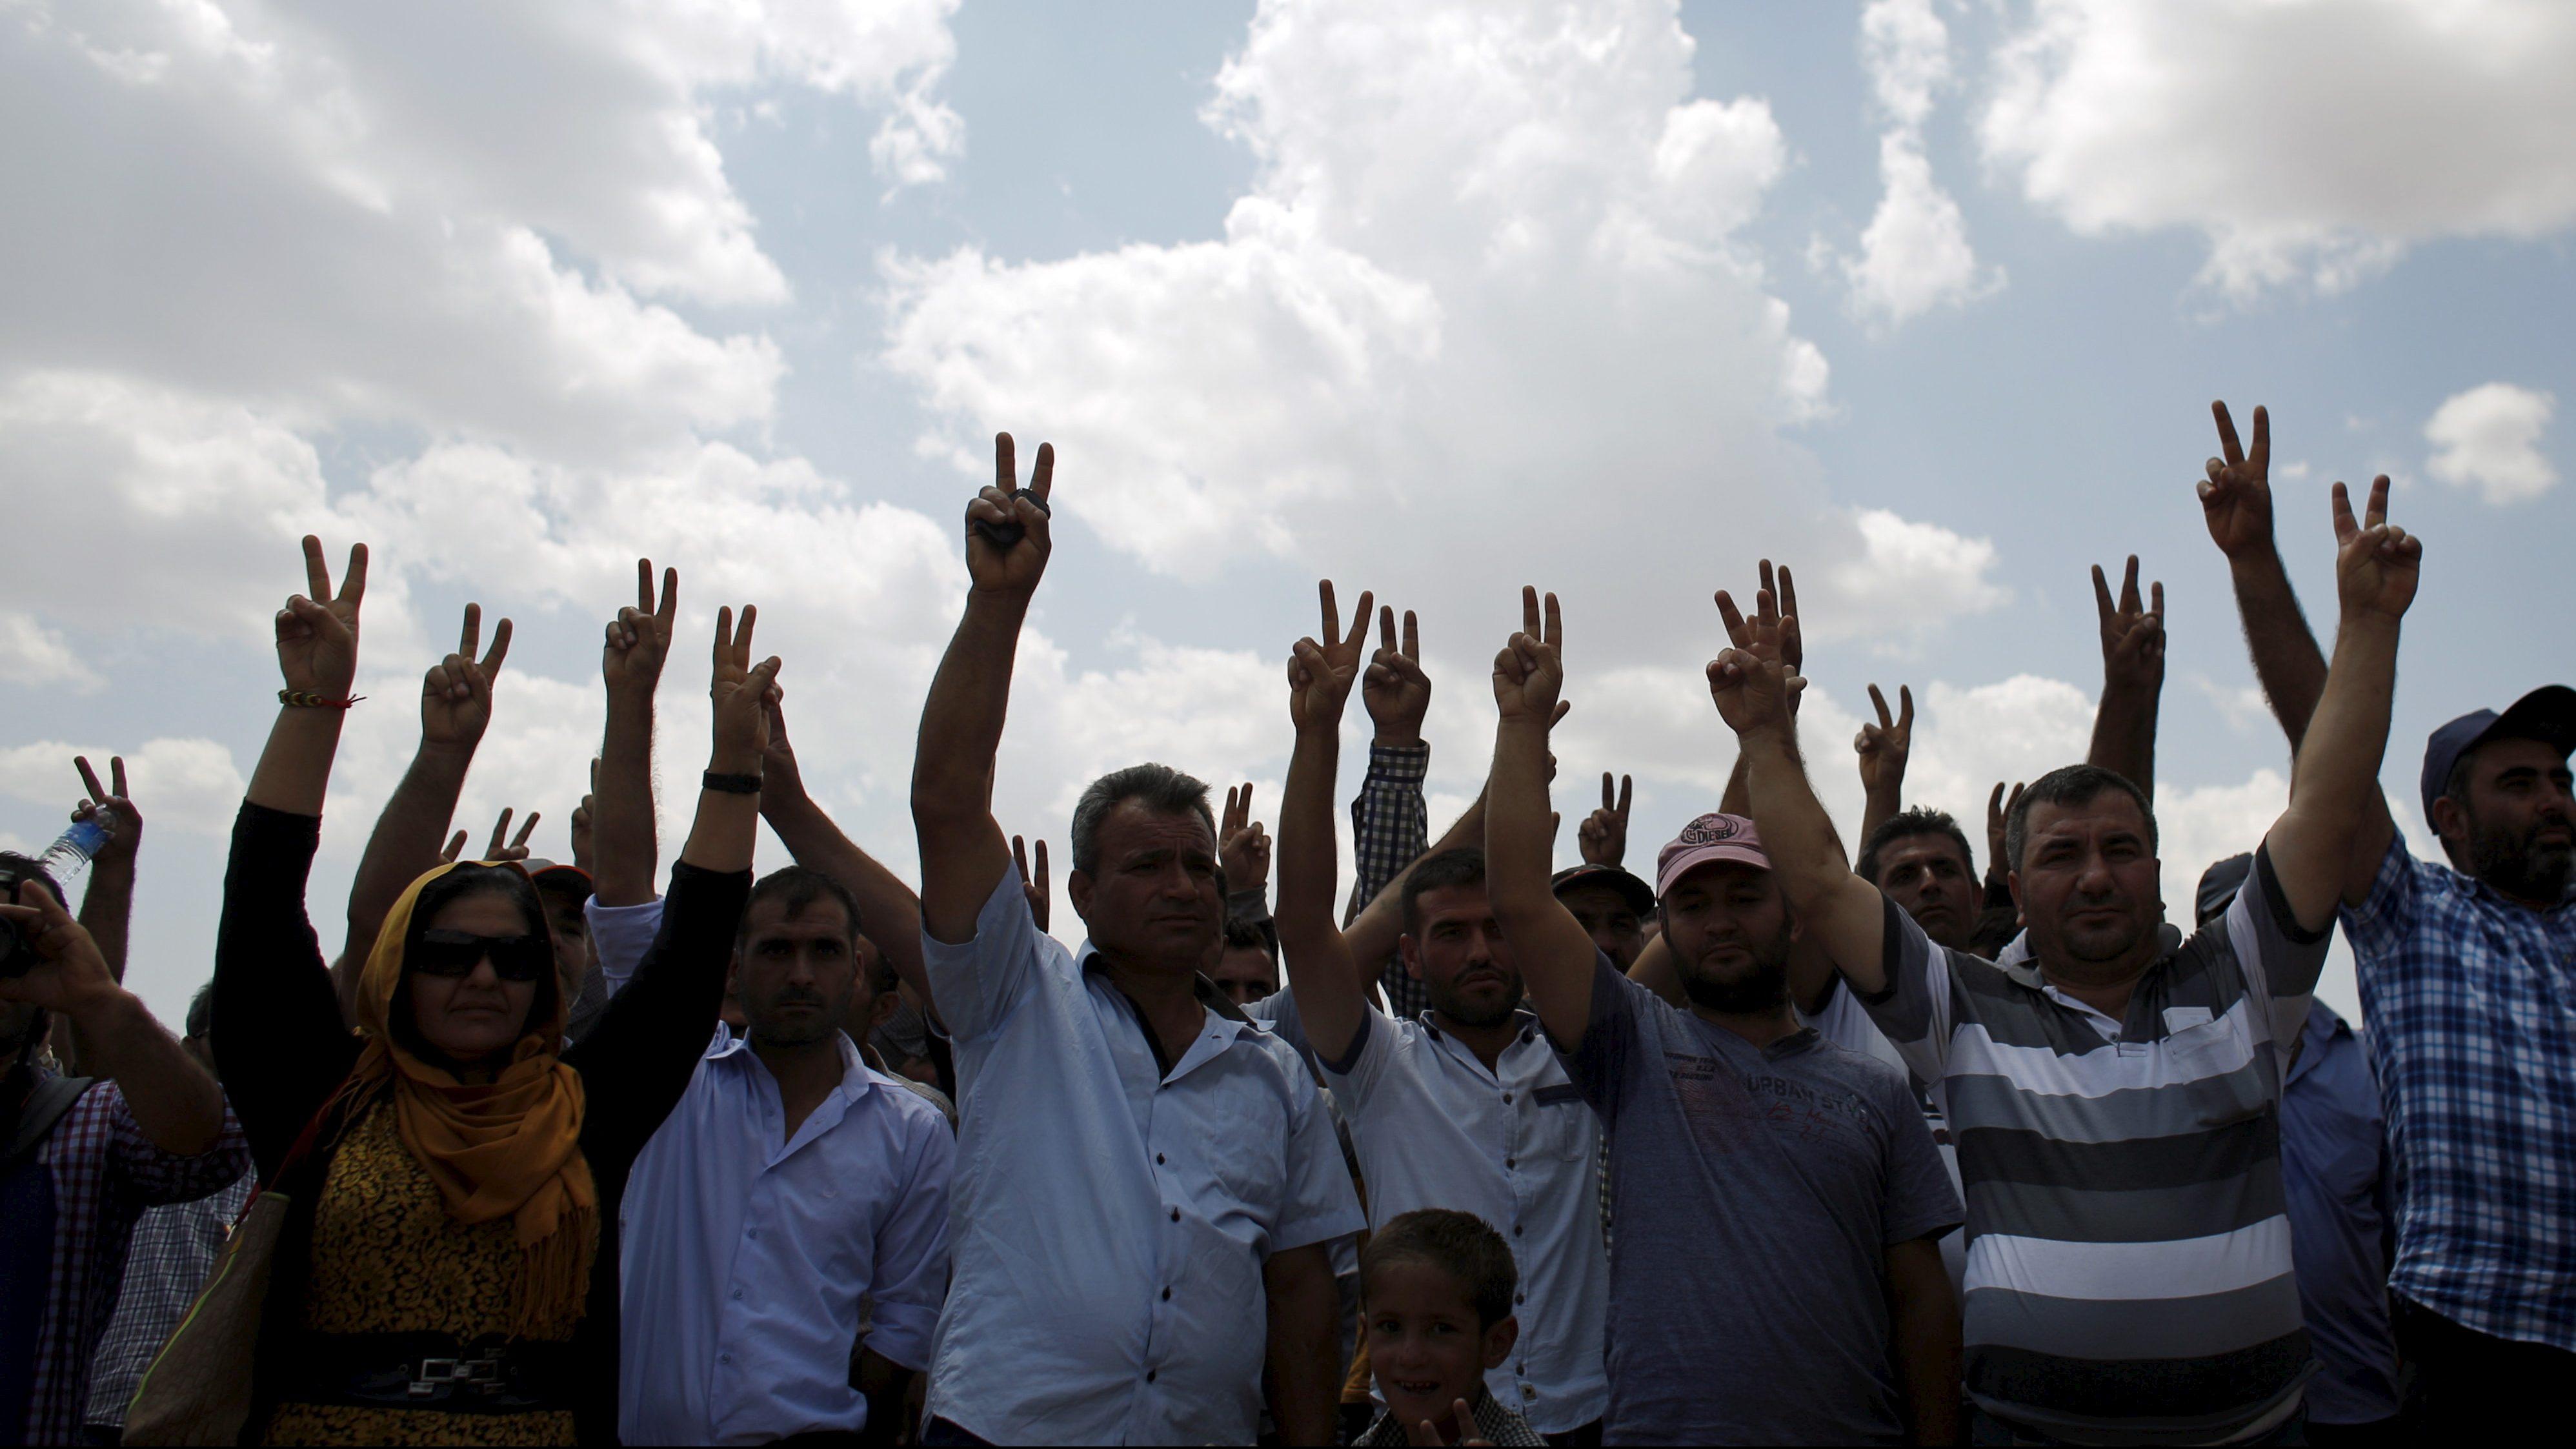 Turkish Kurds flash V-signs as they gather near the Mursitpinar border gate in solidarity with Syrian Kurds in Kobani, in Suruc, Sanliurfa province, Turkey